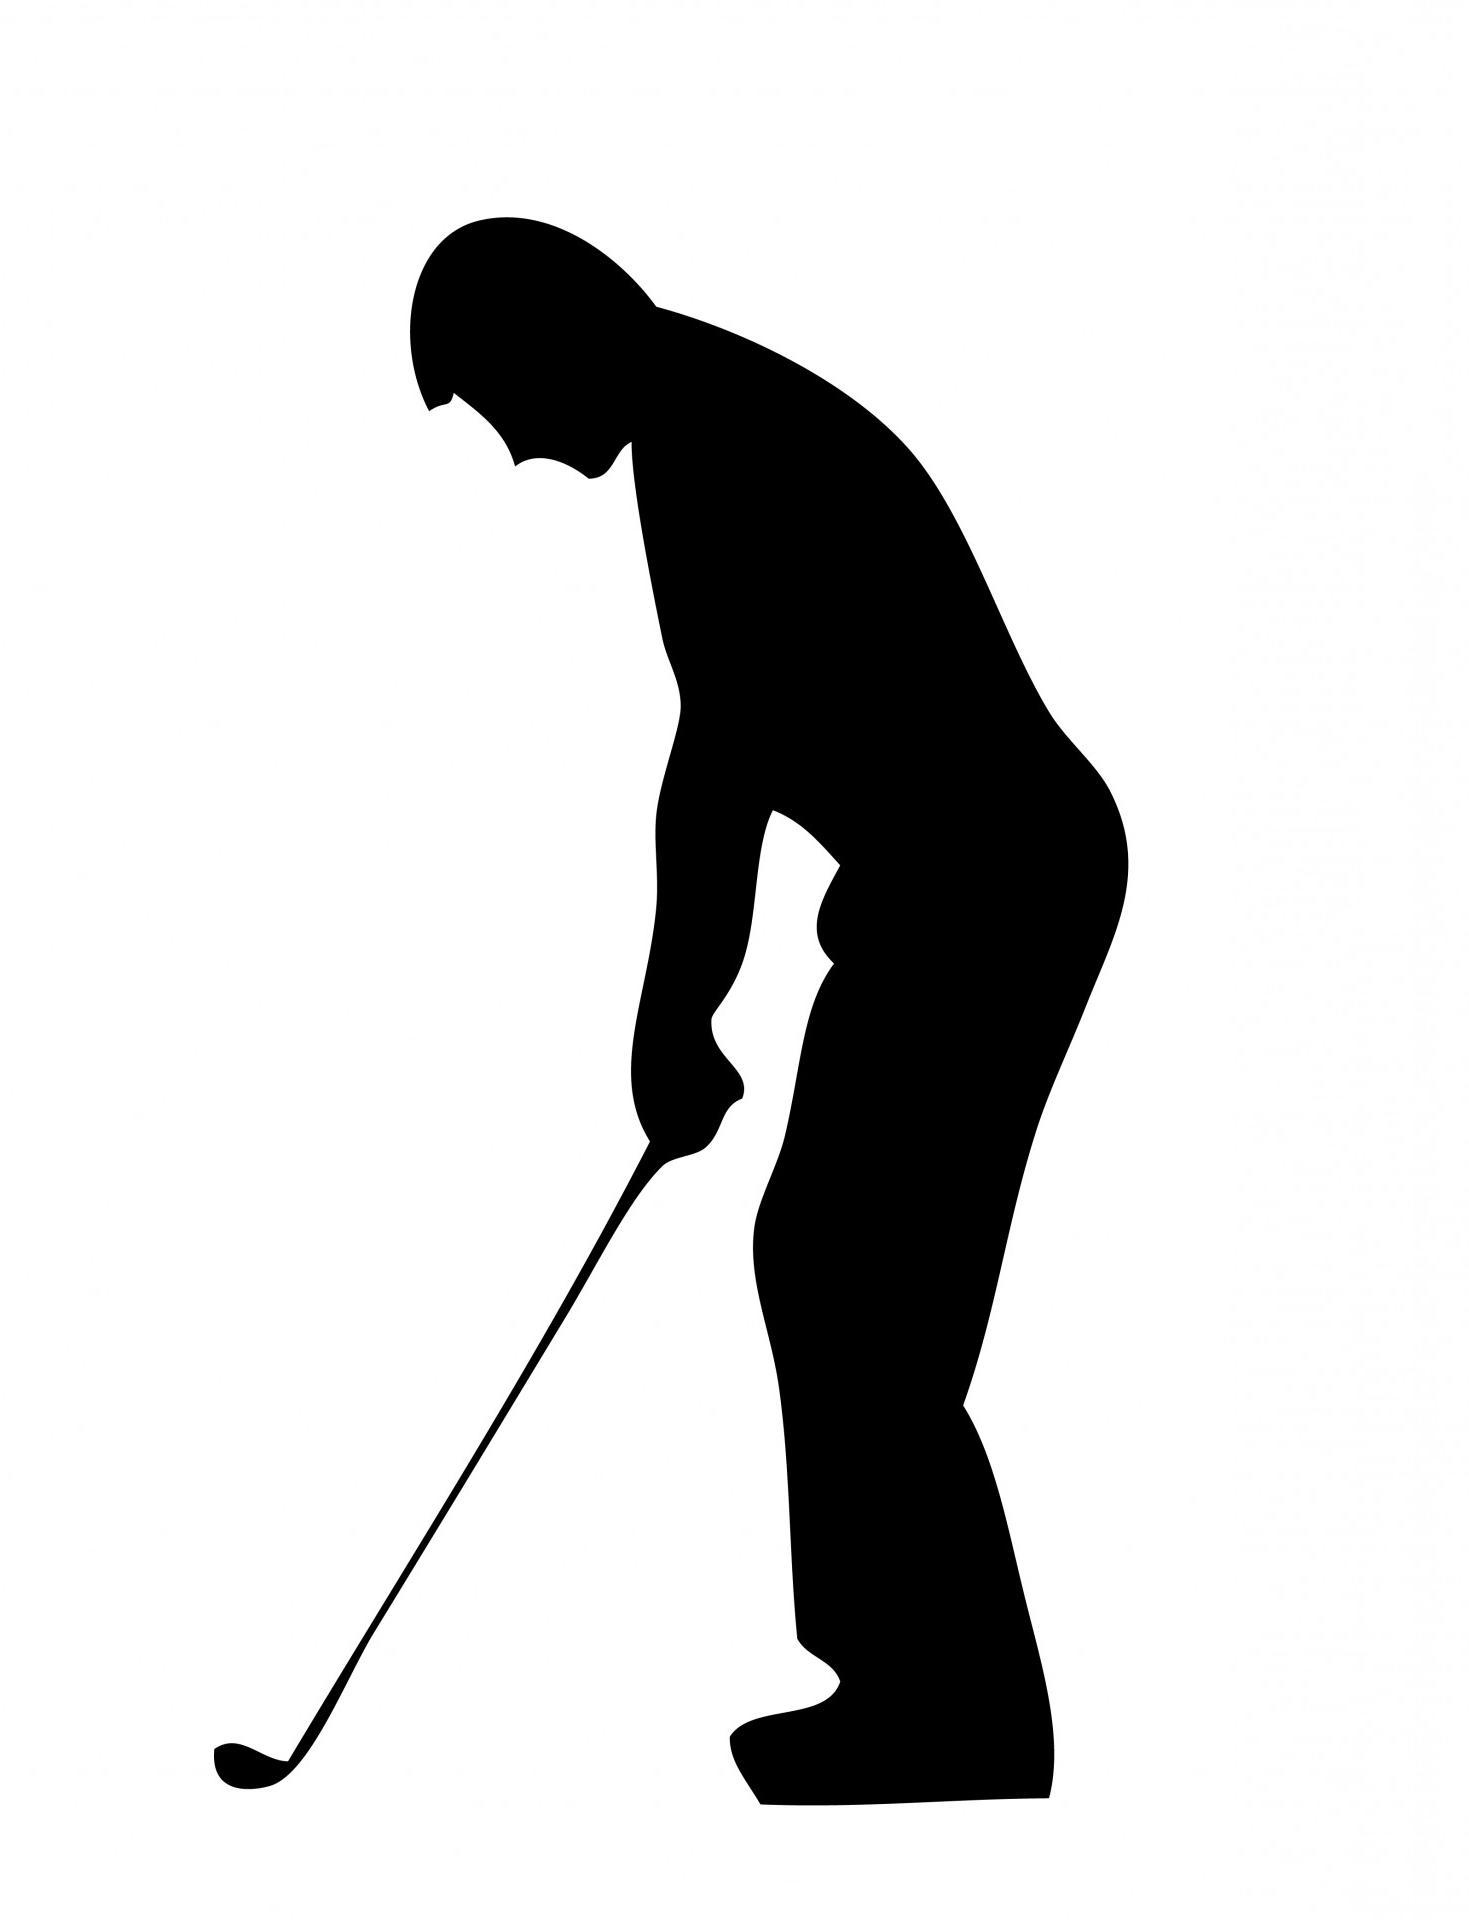 1469x1920 Best Hd Golf Silhouette Art File Free